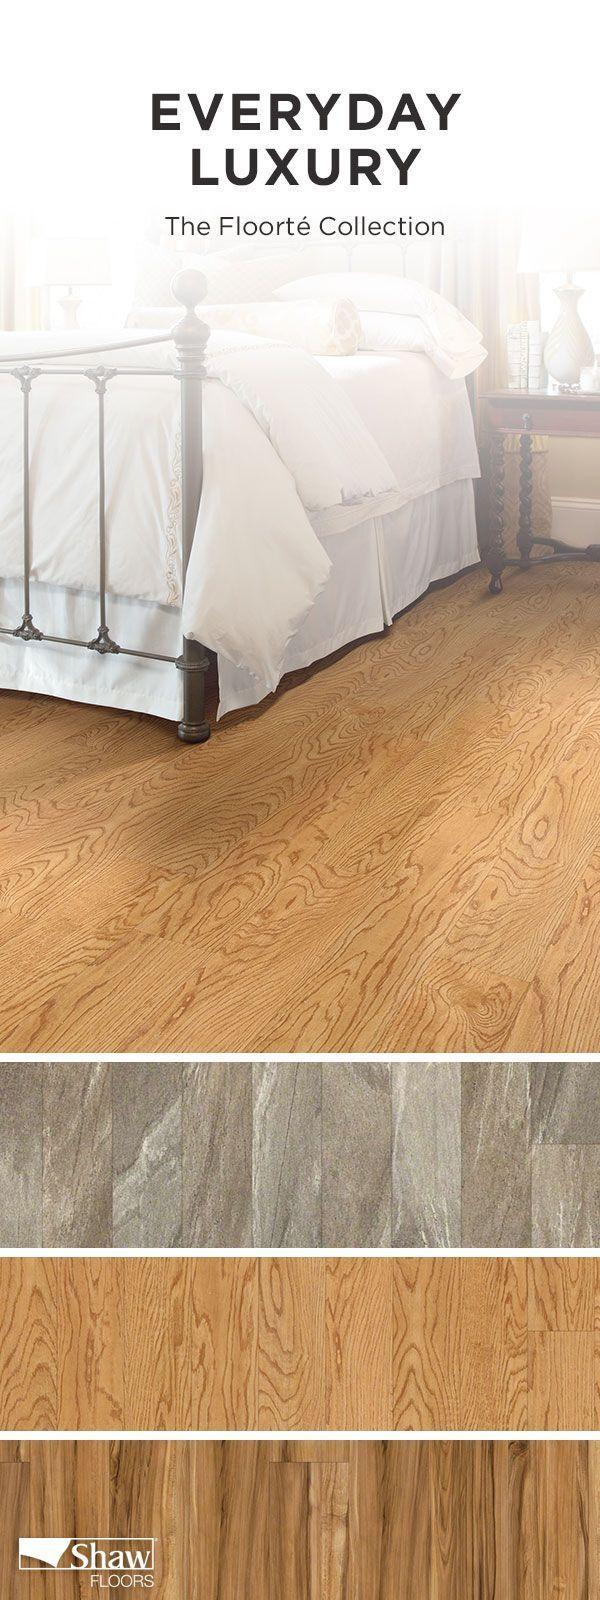 Hardwood Floor Refinishing toledo Of 261 Best Basement Flooring Images On Pinterest Basement Basement Regarding whether Youre Looking for Kitchen Floors or Basement Floors Luxury Vinyl Plank Flooring Should Be On Your List Of Considerations